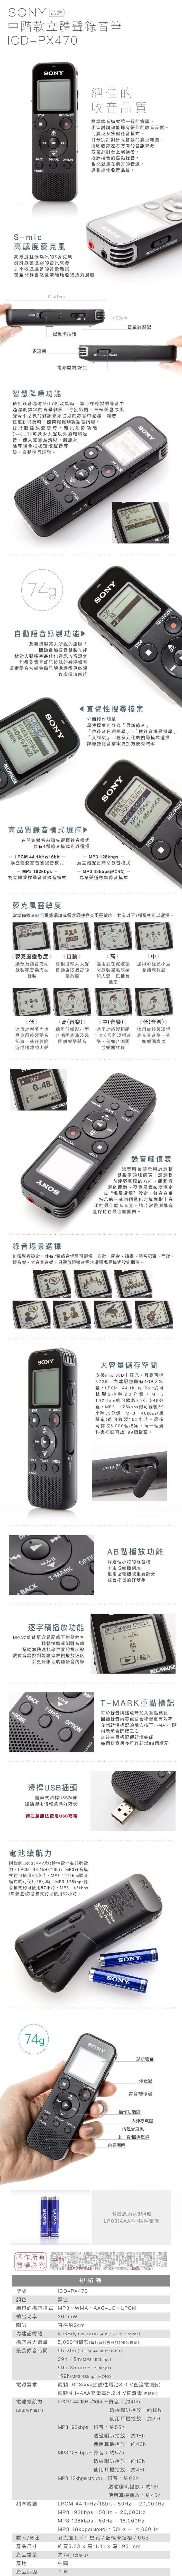 SONY 錄音筆 ICD-PX470 擴充32G 繁體中文介面【平輸-貿易商保固一年】 台